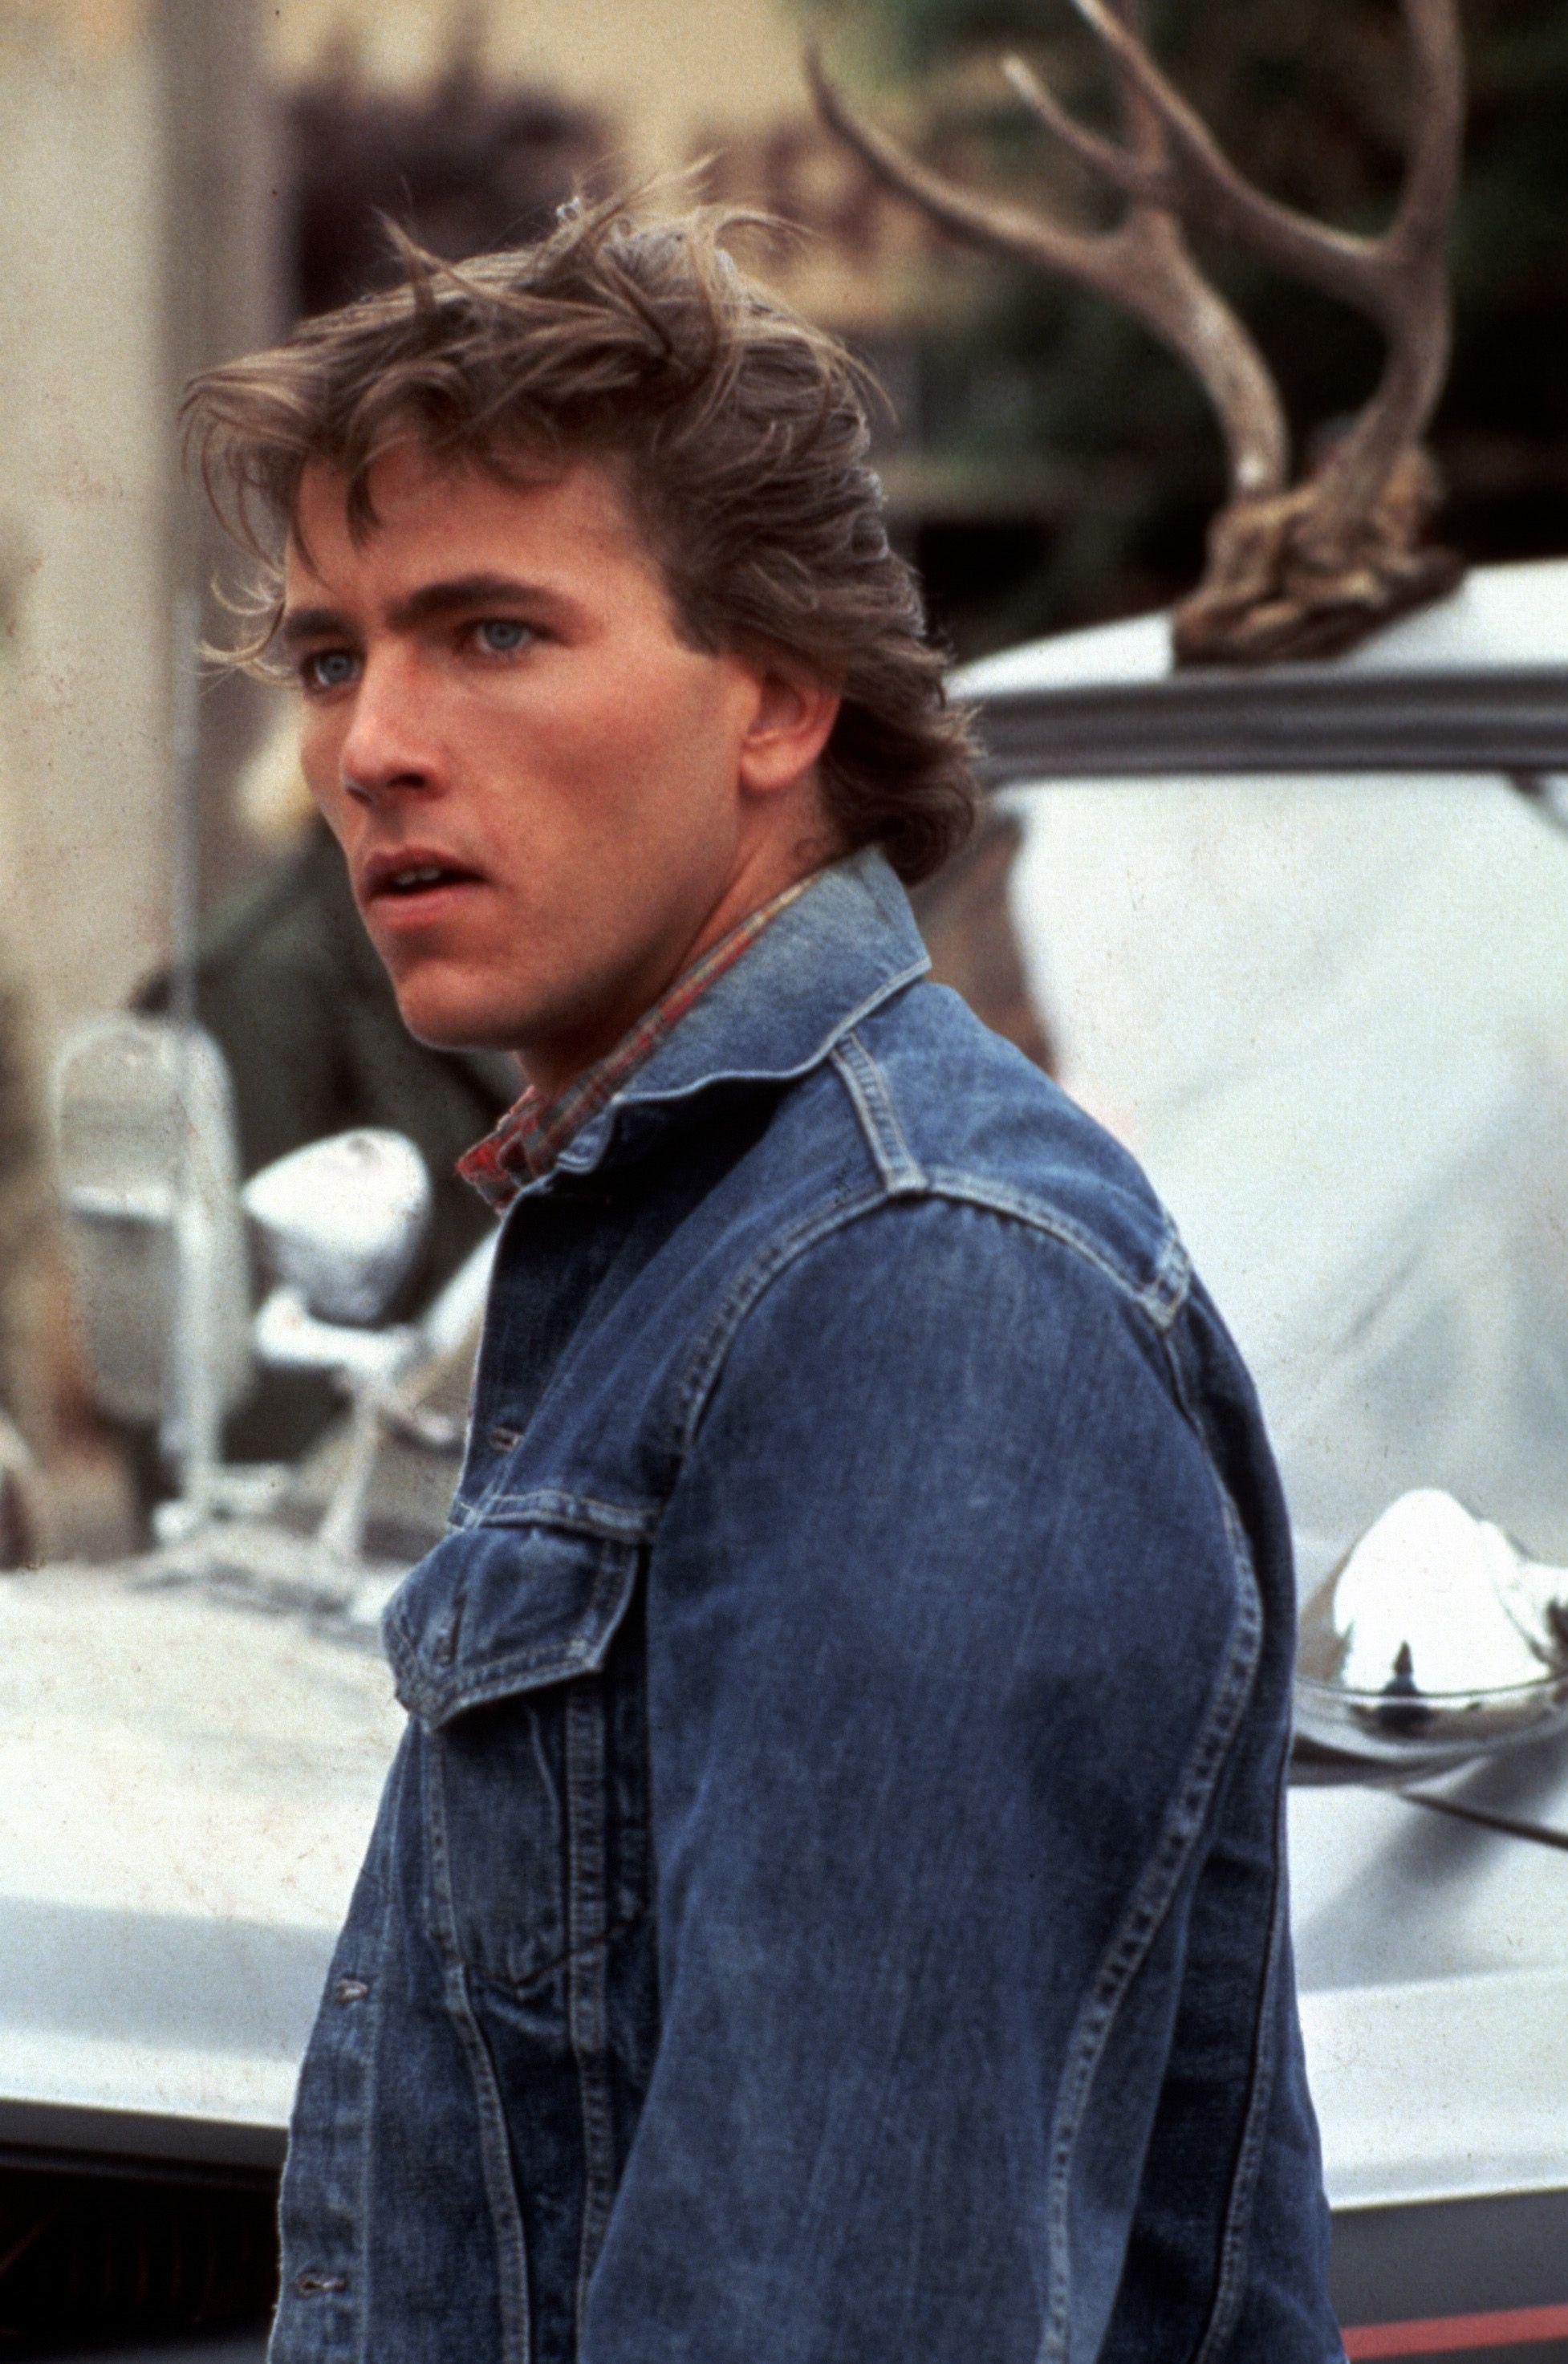 footloose 1984 films of the 1980s pinterest 1980s